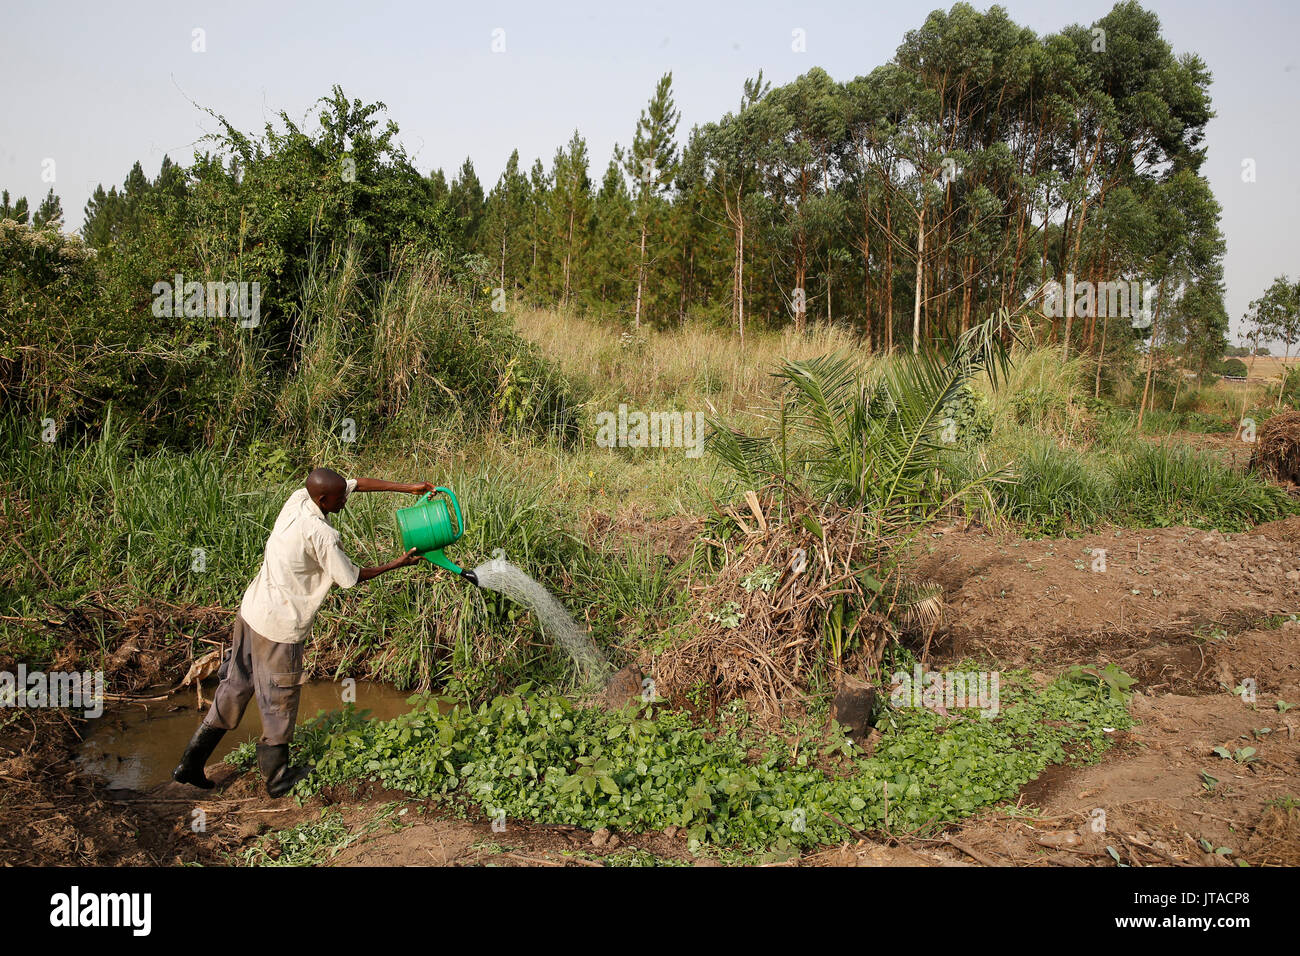 Farmer Apollo Byarunga received two loans from ENCOT microfinance, Uganda, Africa - Stock Image